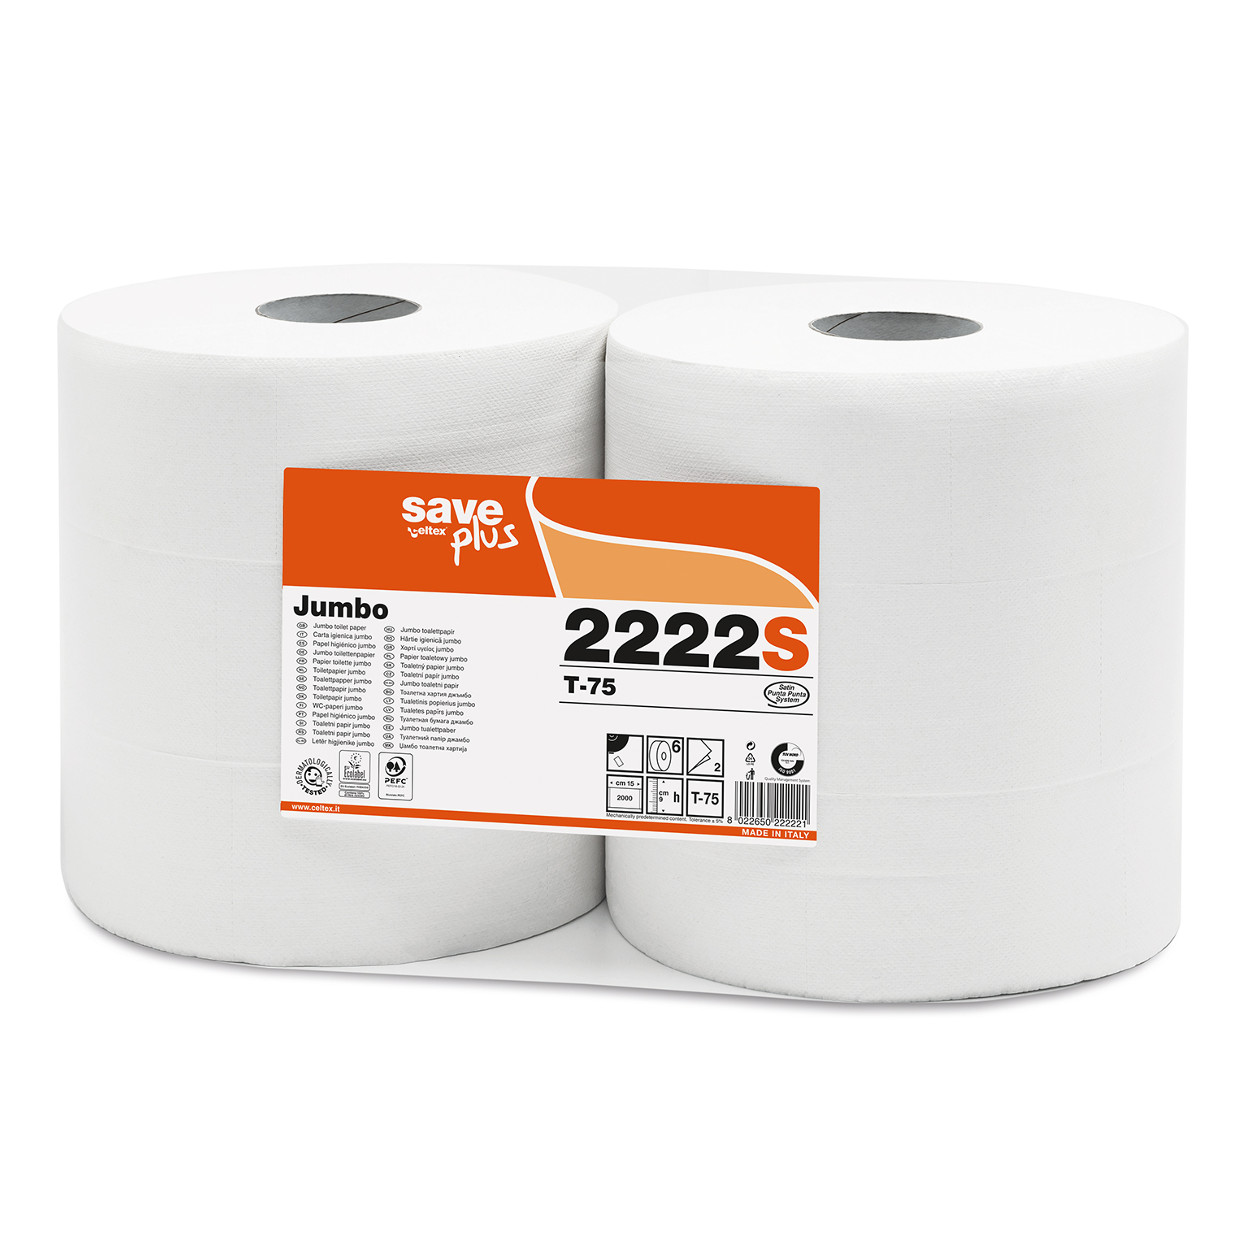 Toaletný papier Jumbo MAXI Plus